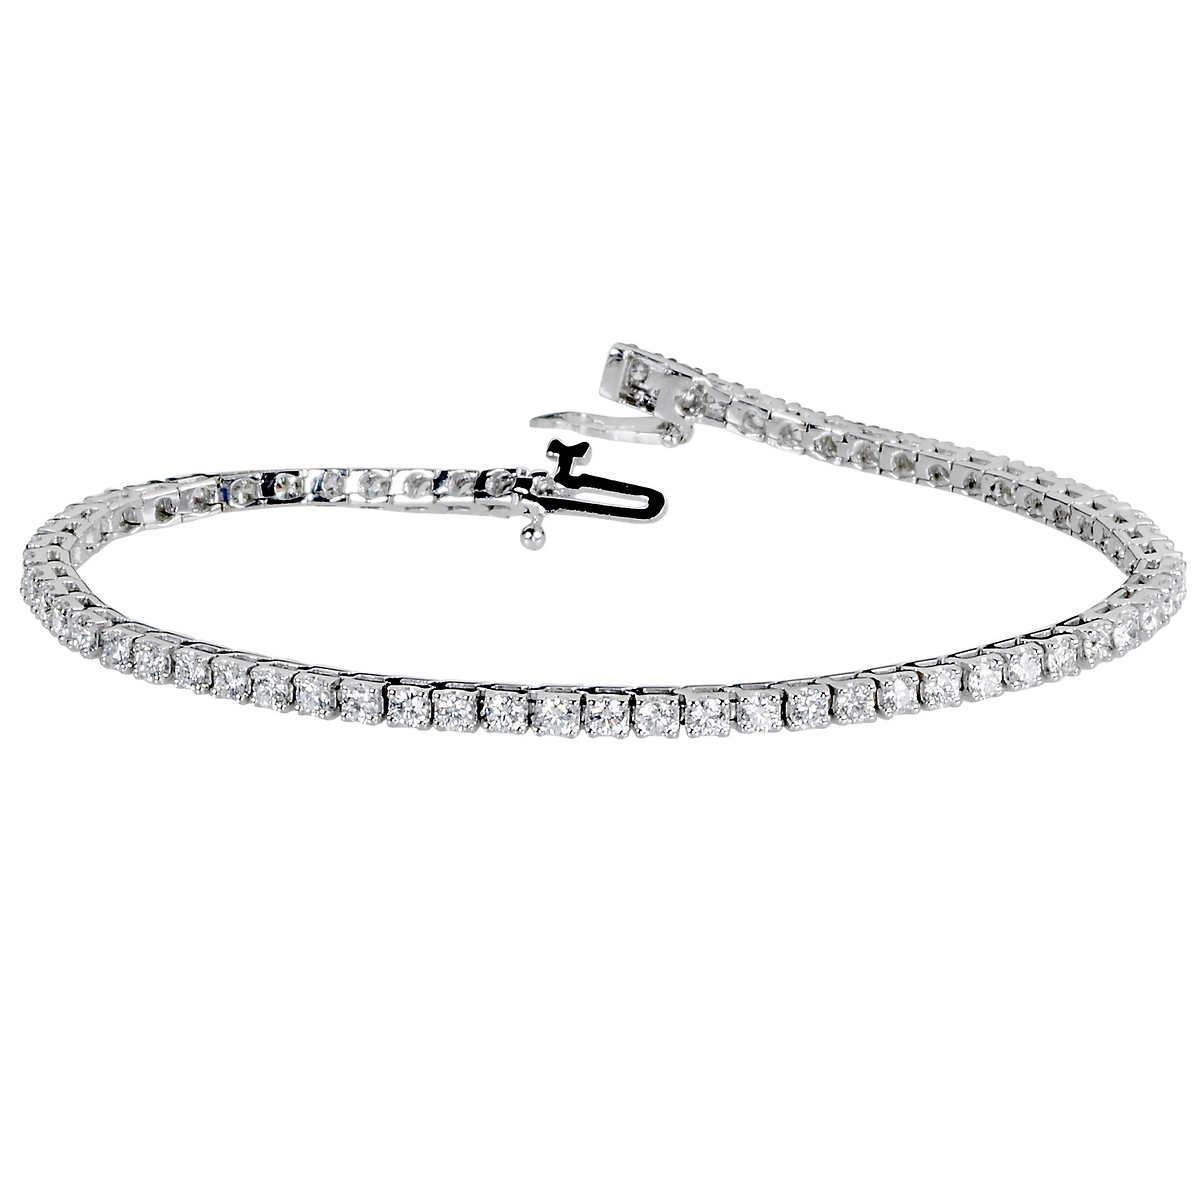 3372089ae ... Round Brilliant 3.00 ctw VS2 Clarity, I Color Diamond 14kt White Gold  Bracelet. 1 1